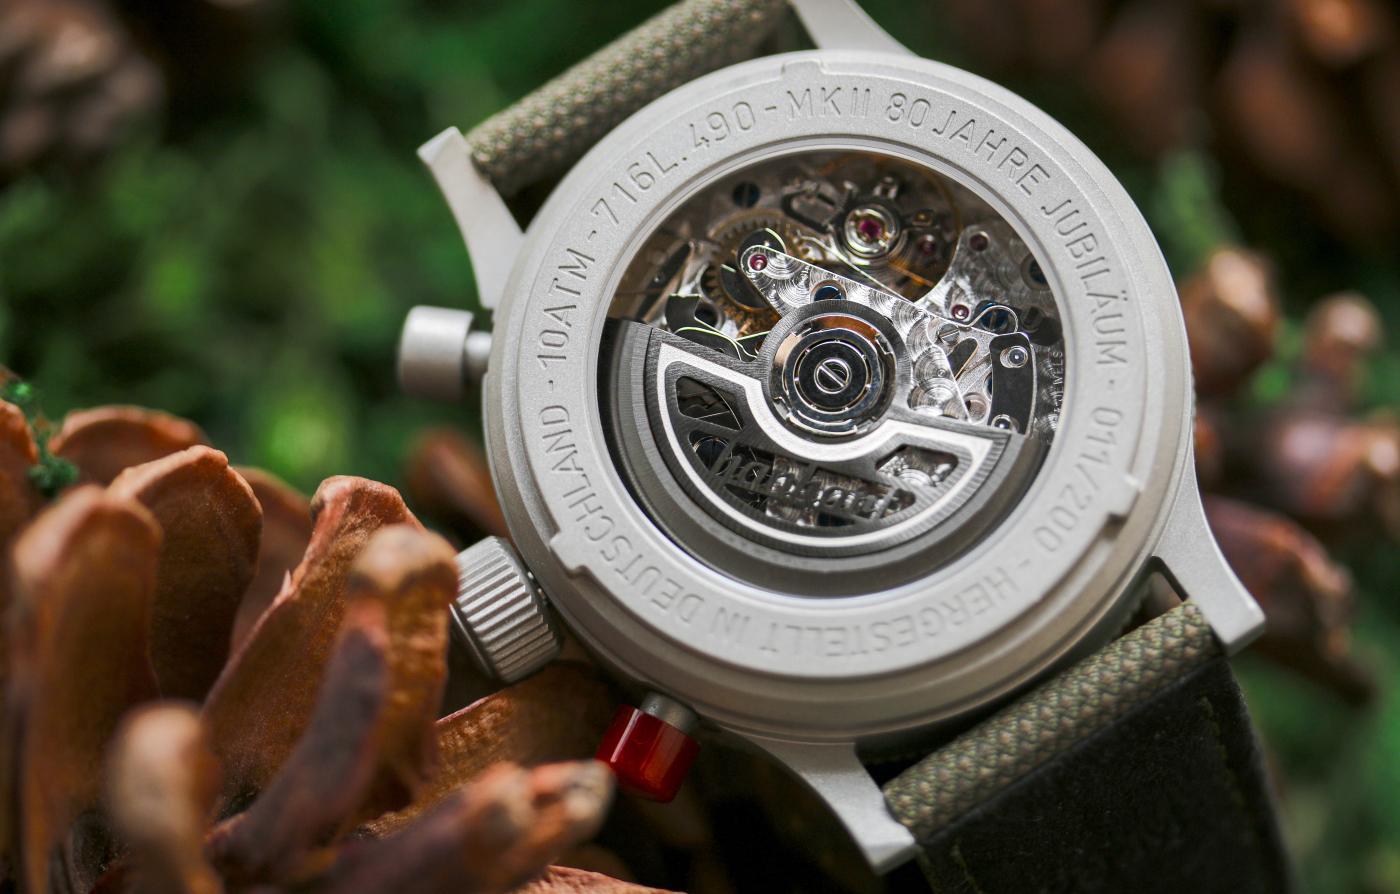 Hanhart-pioneer-mkii-80-years-limited-edition-back_-_Europa_Star_watch_magazine_2020